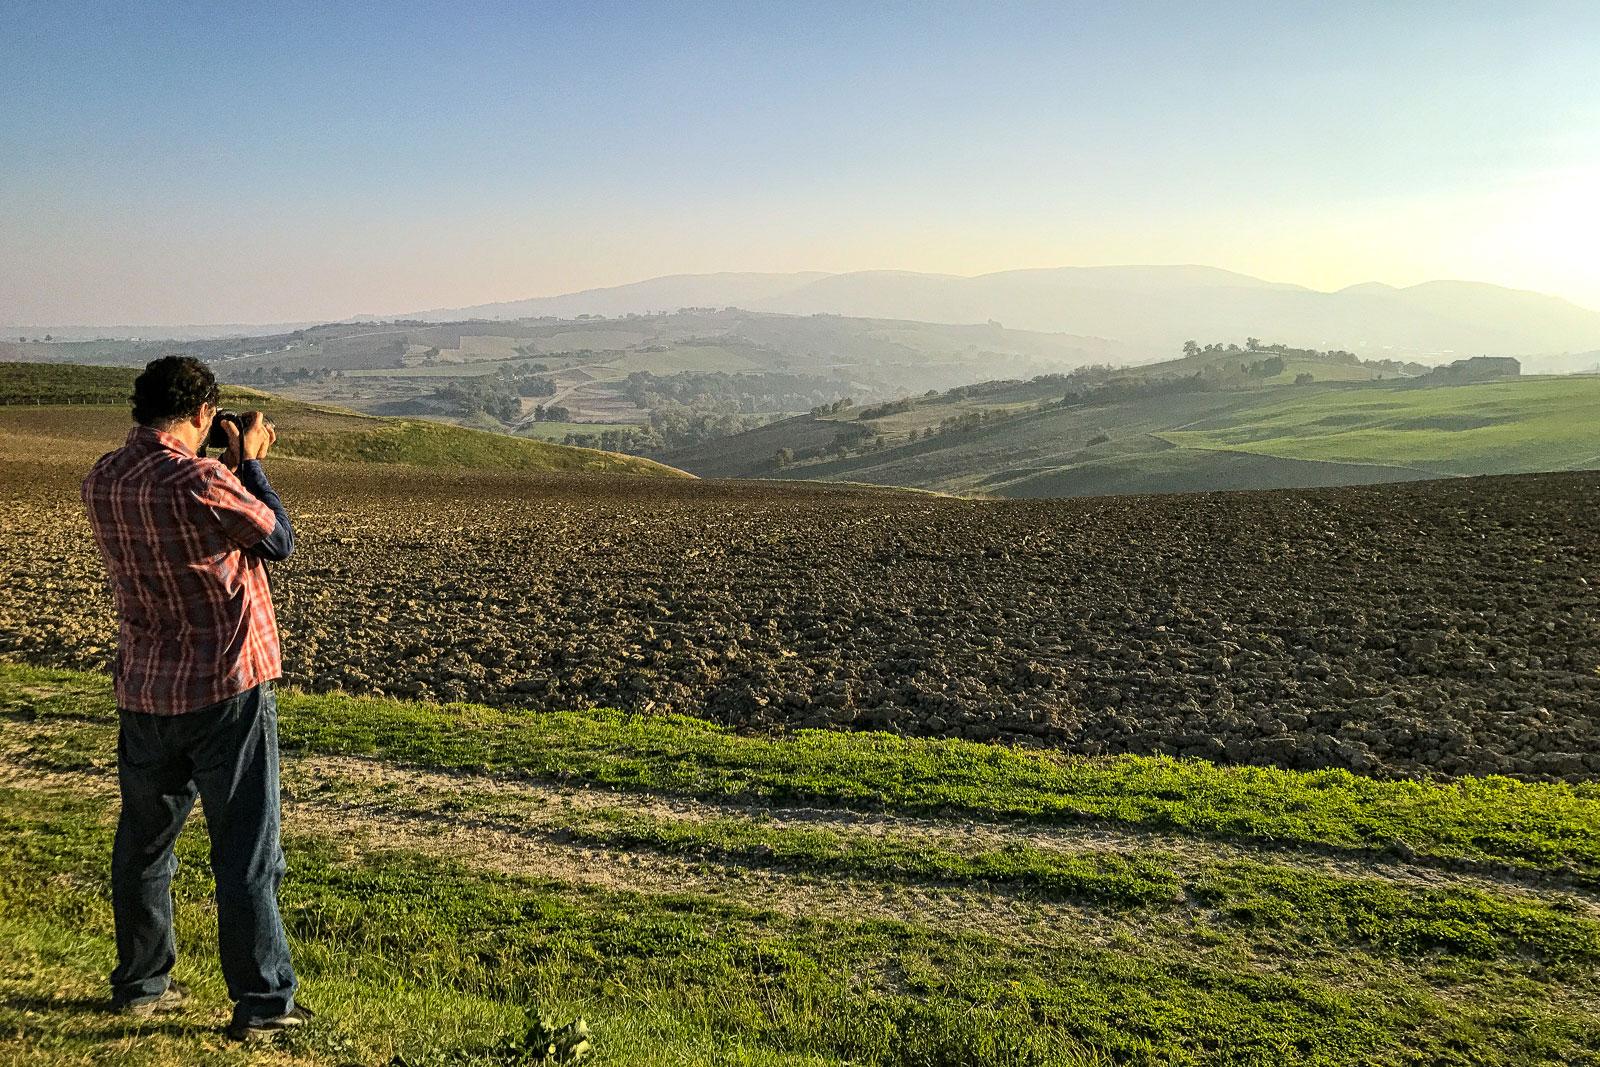 Dietro le quinte nei dintorni di Staffolo - Gianluca Storani Photo Art